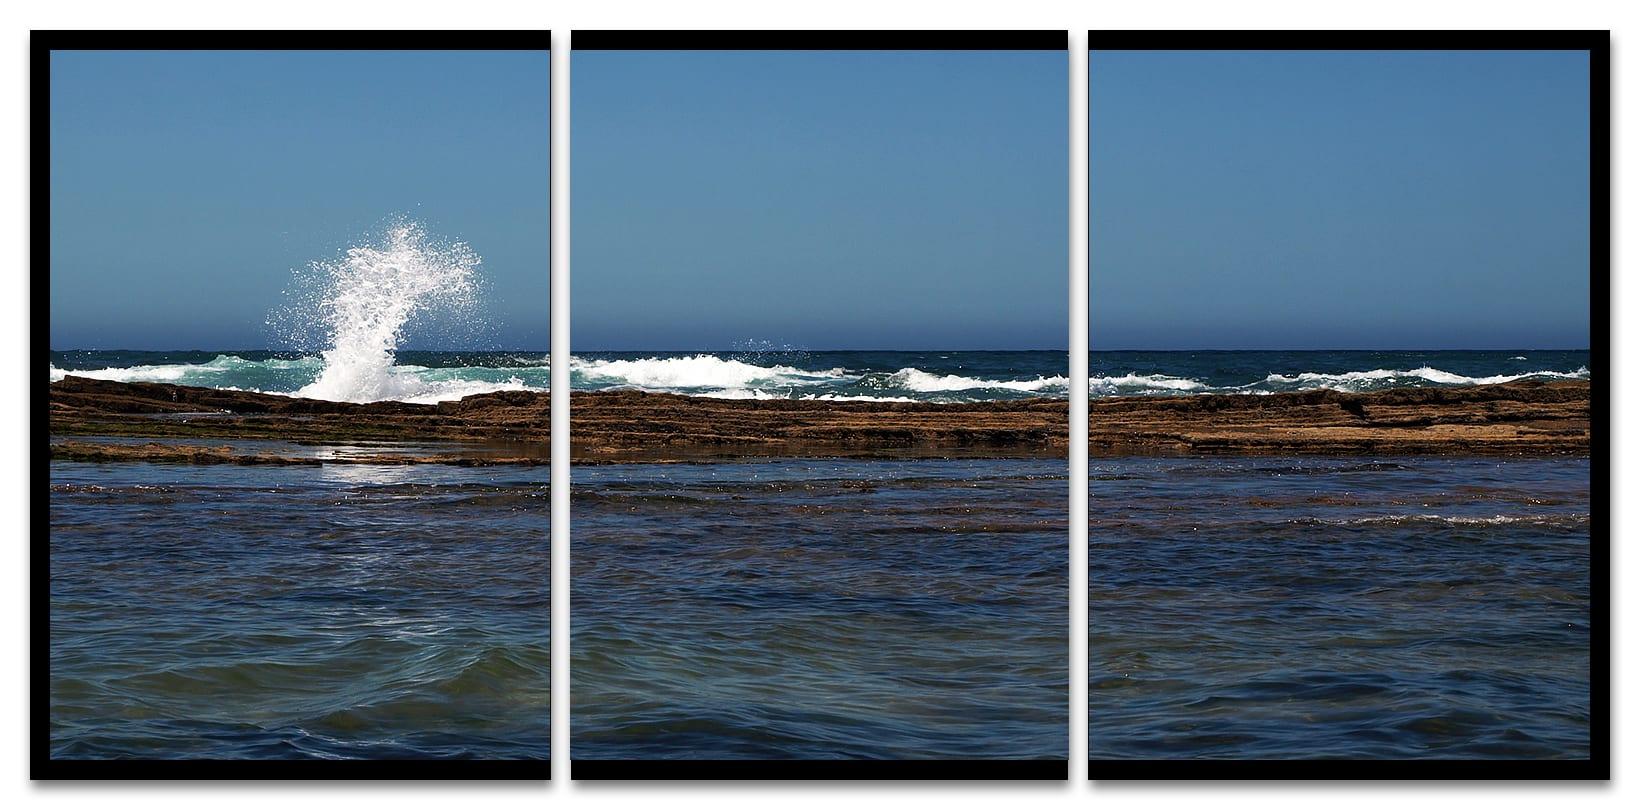 La ola. Tríptico. Praia de Monte Clérigo